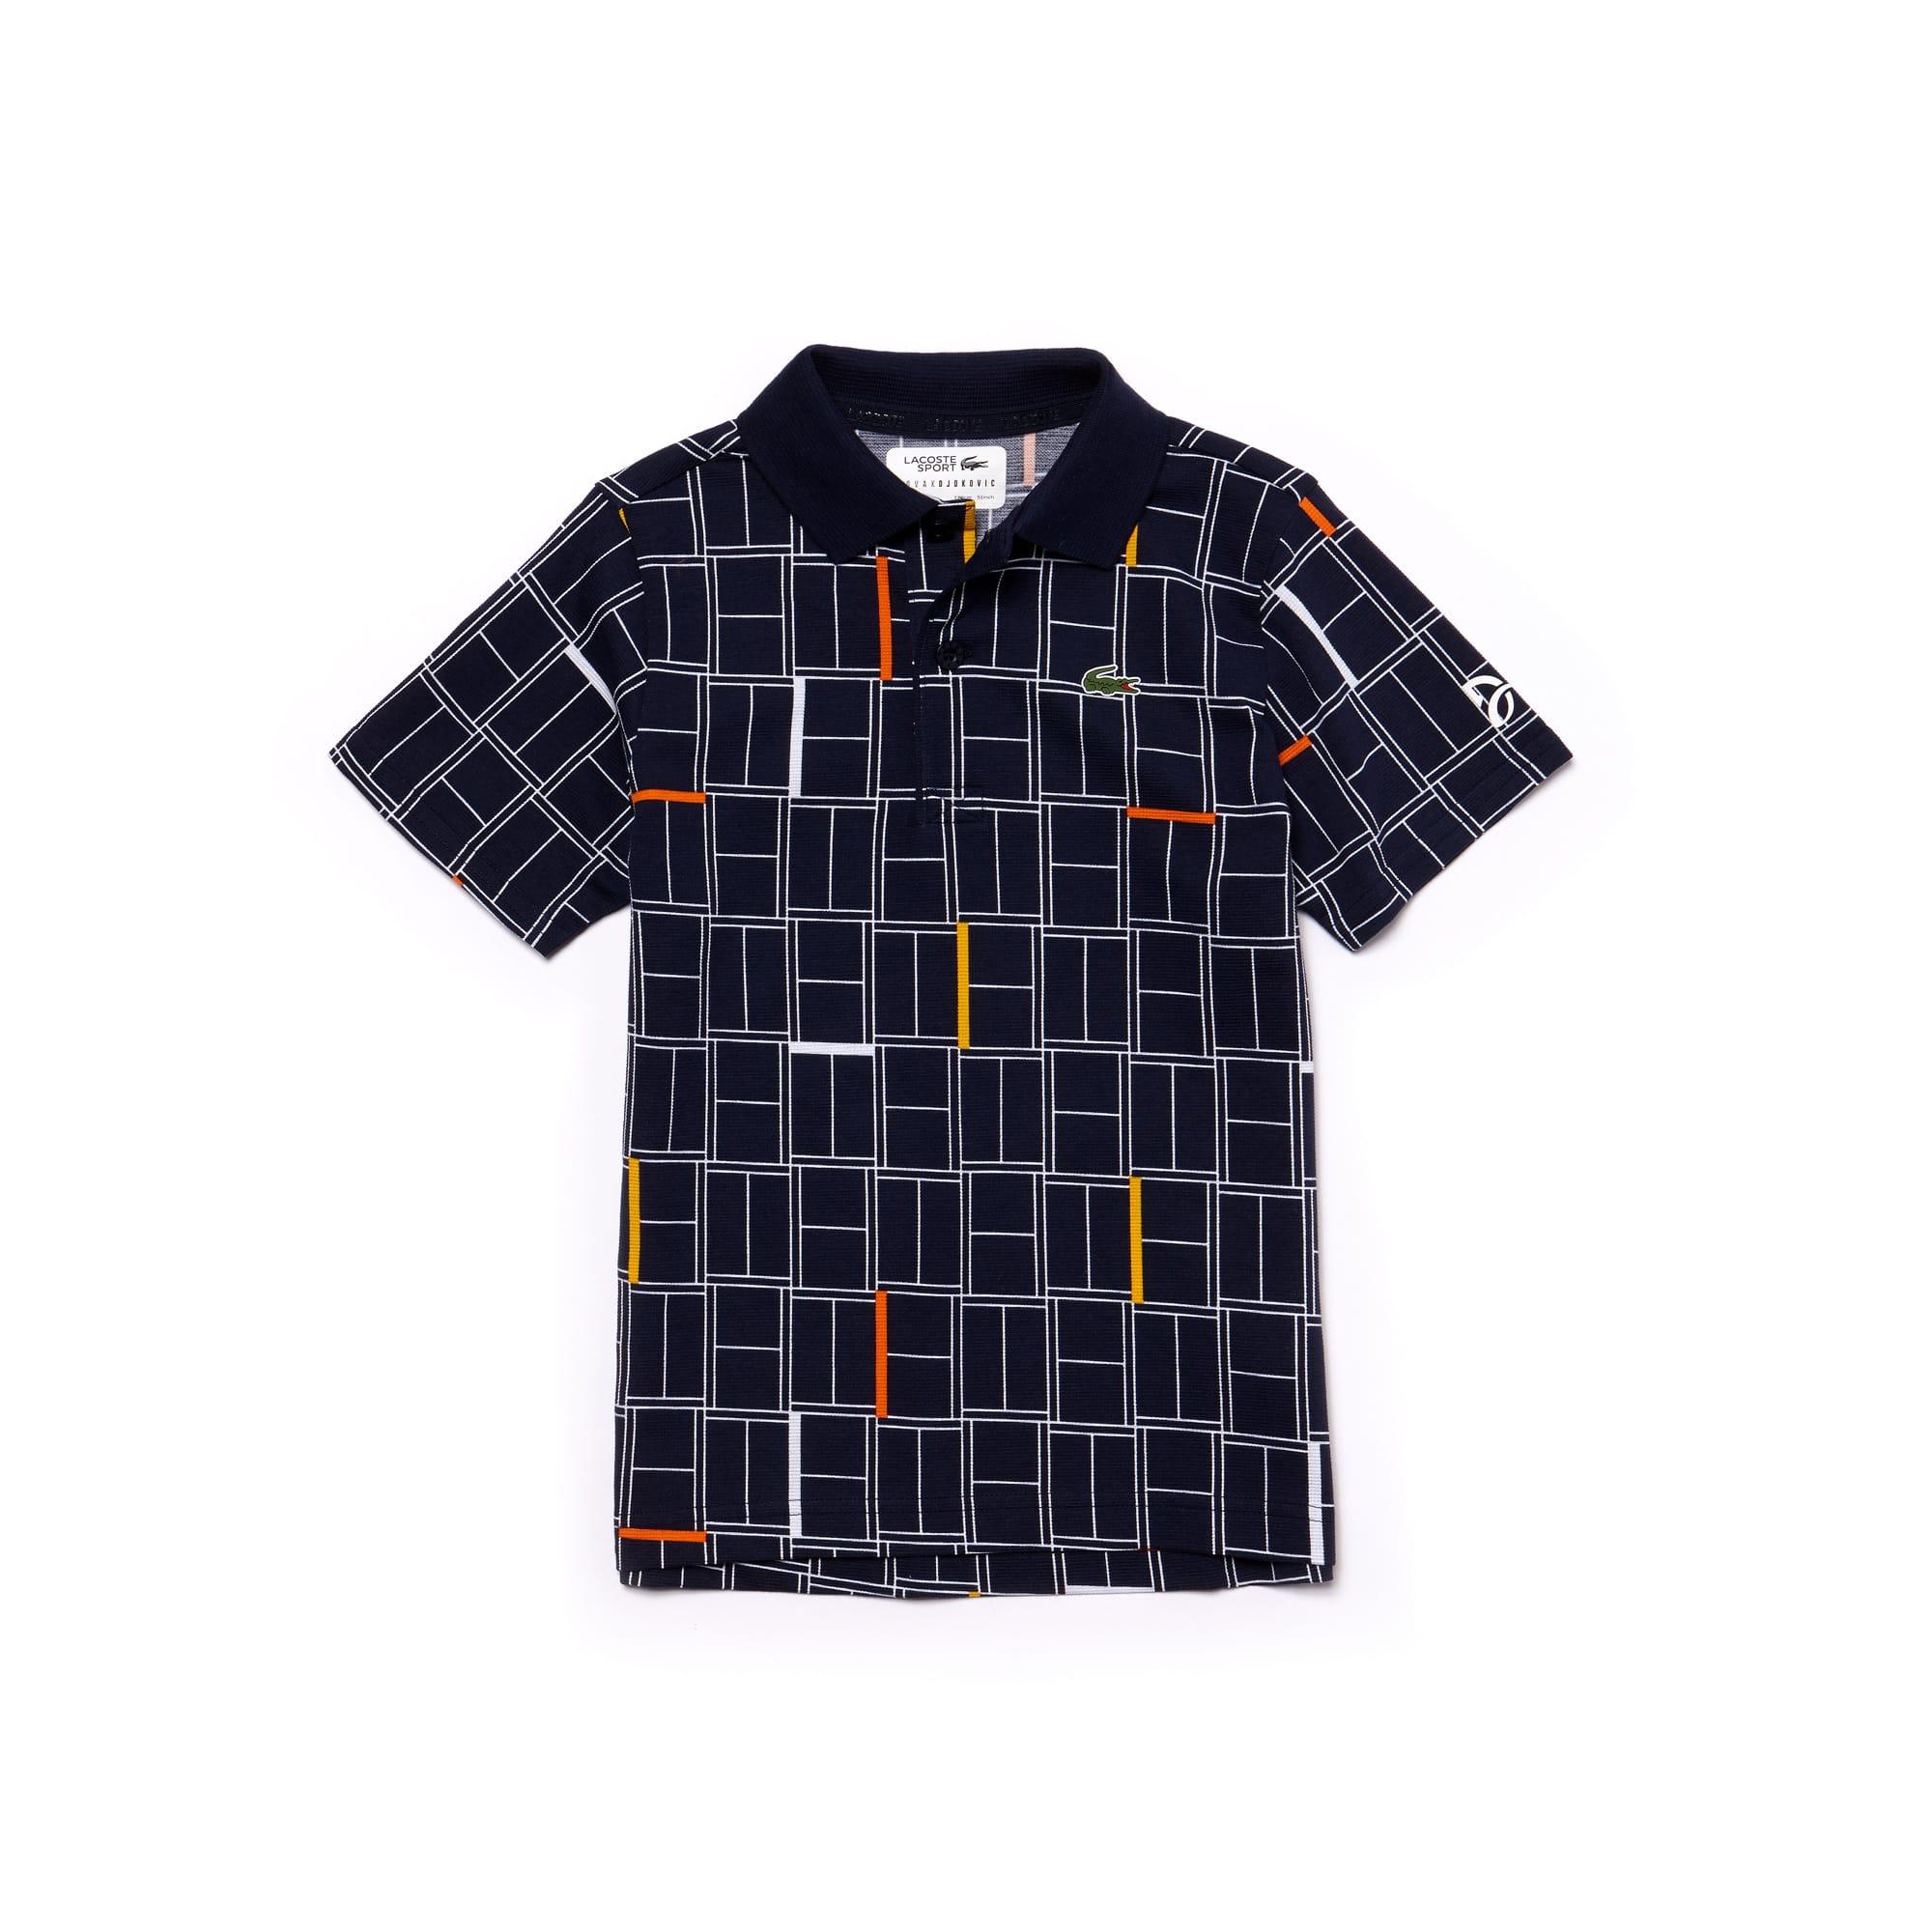 Boys' LACOSTE SPORT NOVAK DJOKOVIC COLLECTION Print Light Cotton Polo